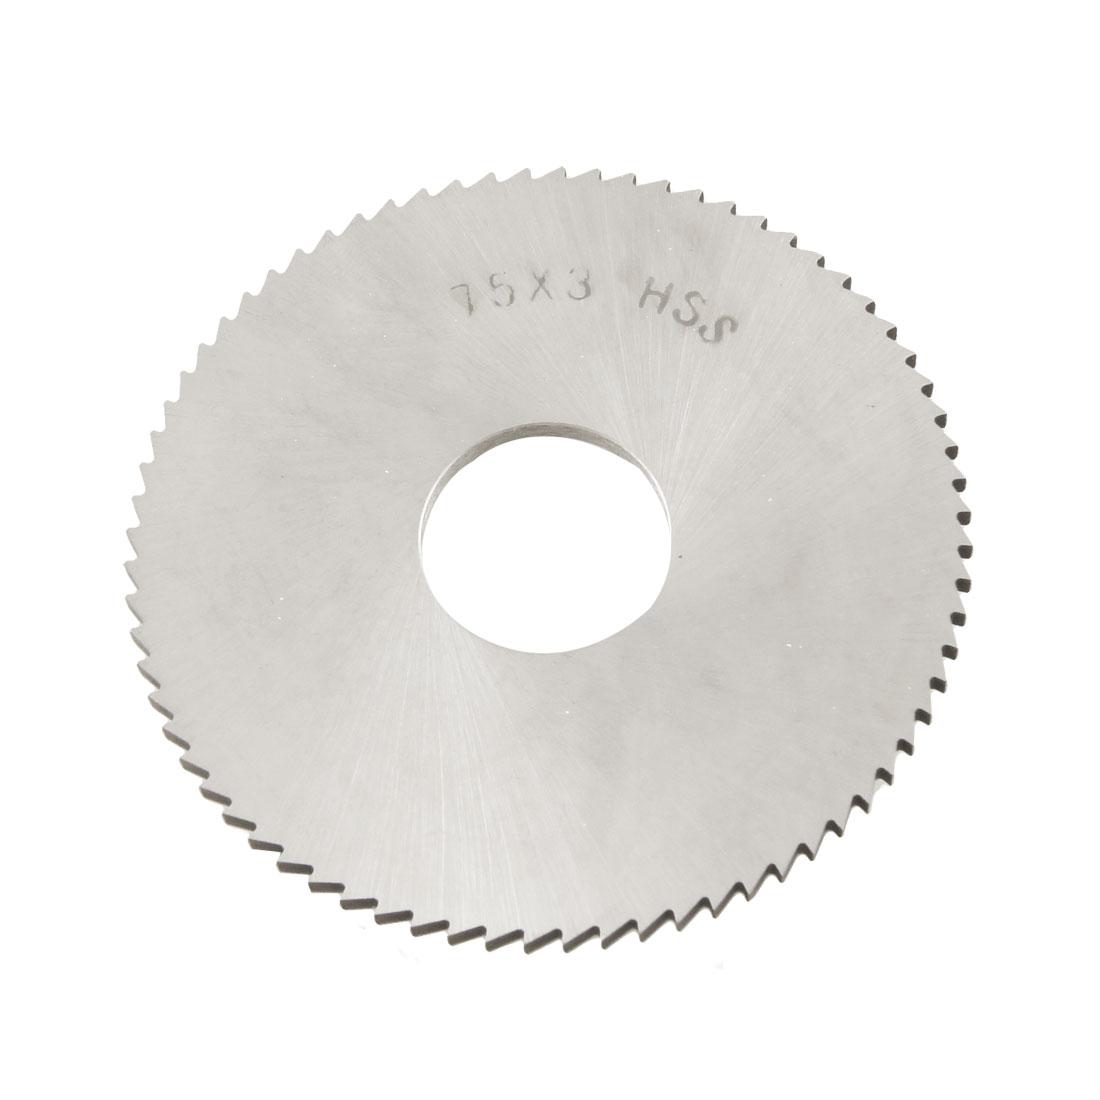 75mm x 22mm x 3mm 72T HSS Circular Slitting Saw Blade Cutter